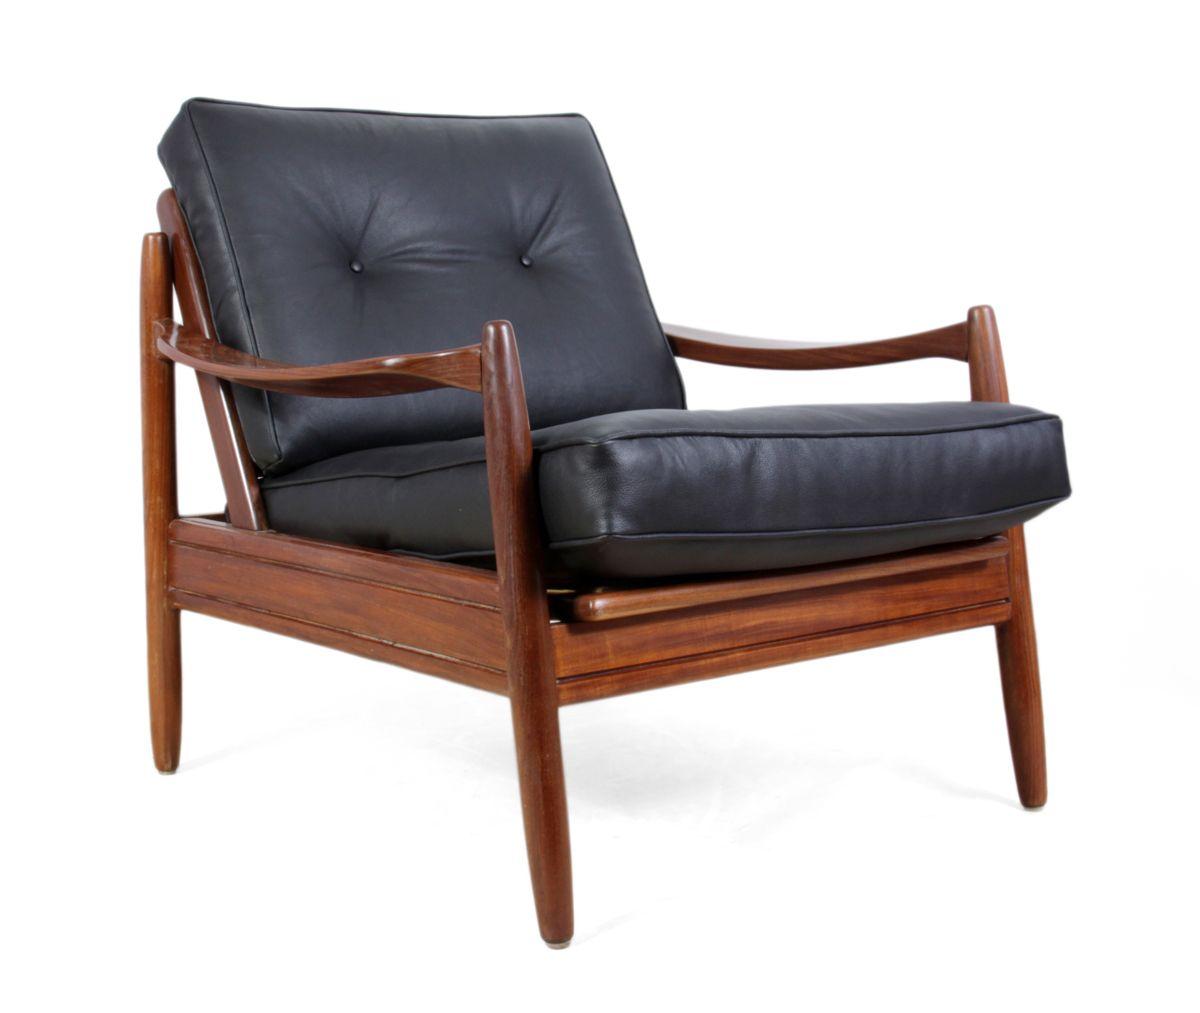 Mid-Century Danish Teak Framed Leather Armchairs, 1960s